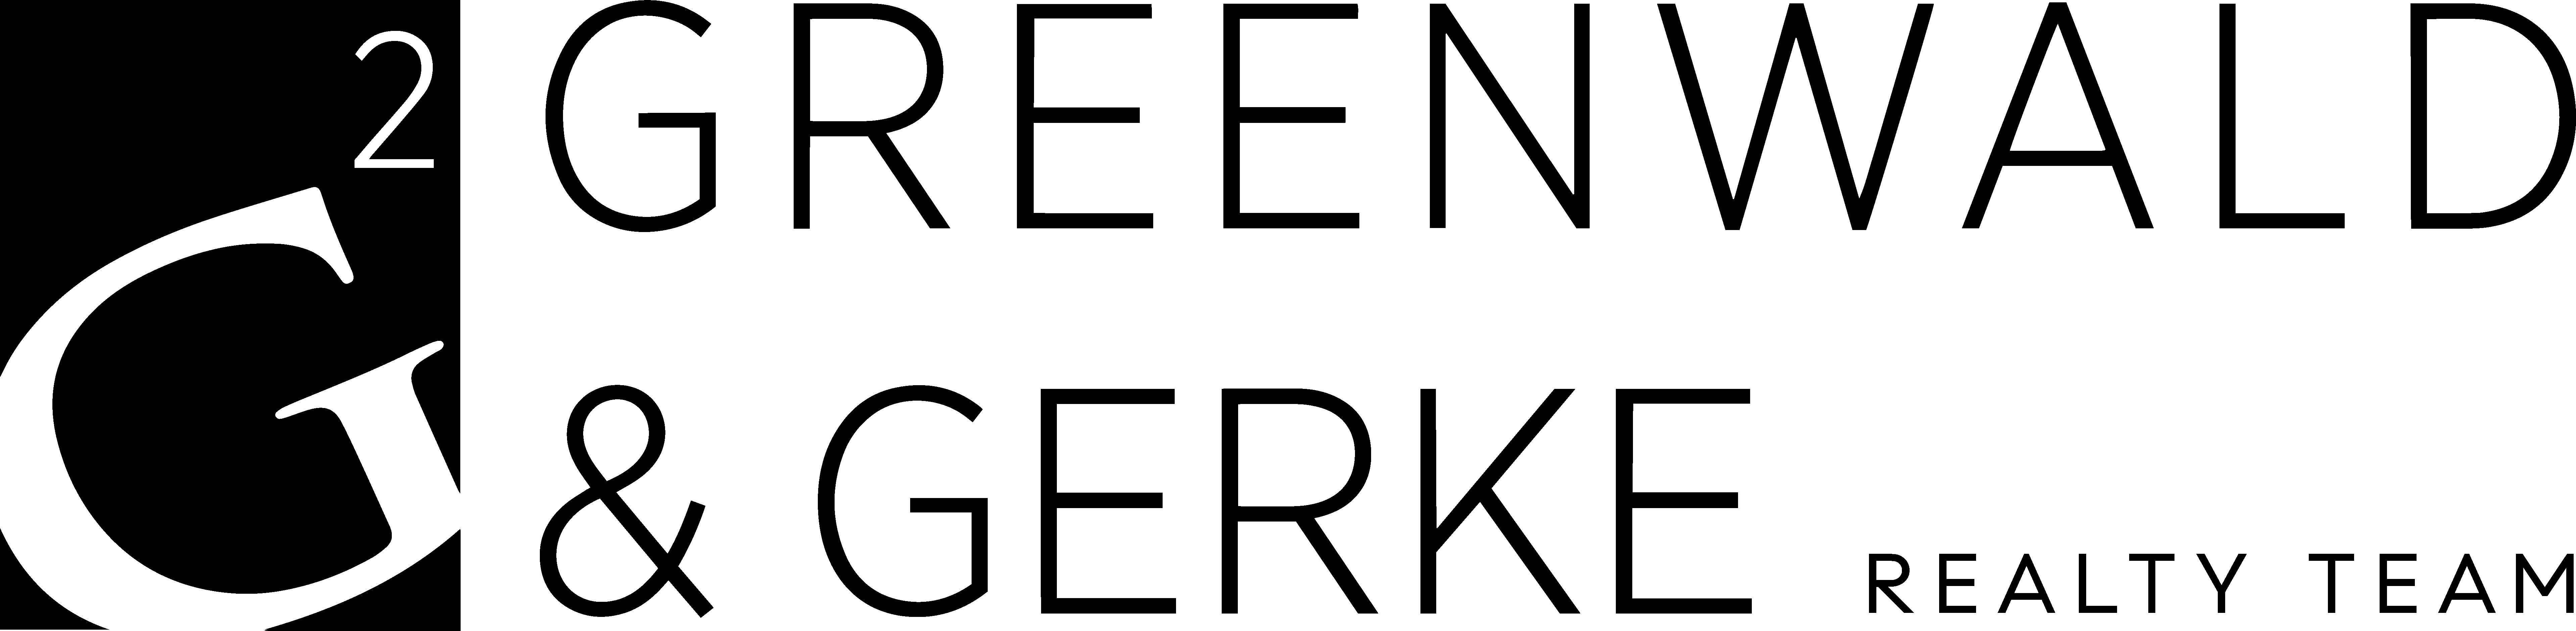 Greenwald Gerke Logo